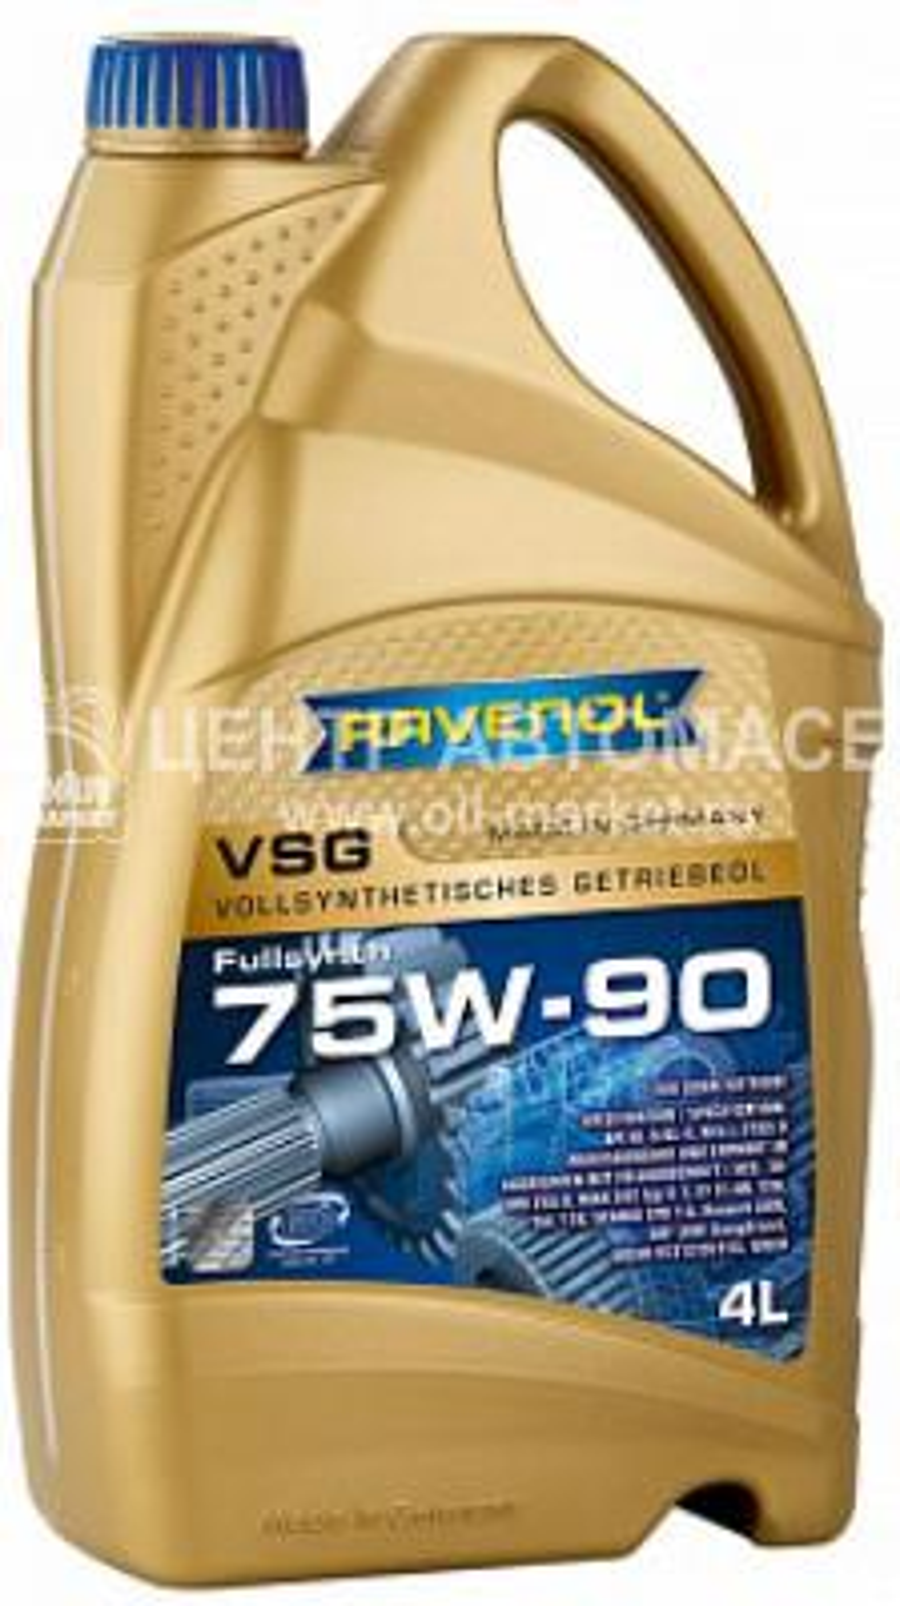 Трансмиссионное масло ravenol vsg sae 75w-90 ( 4л) new